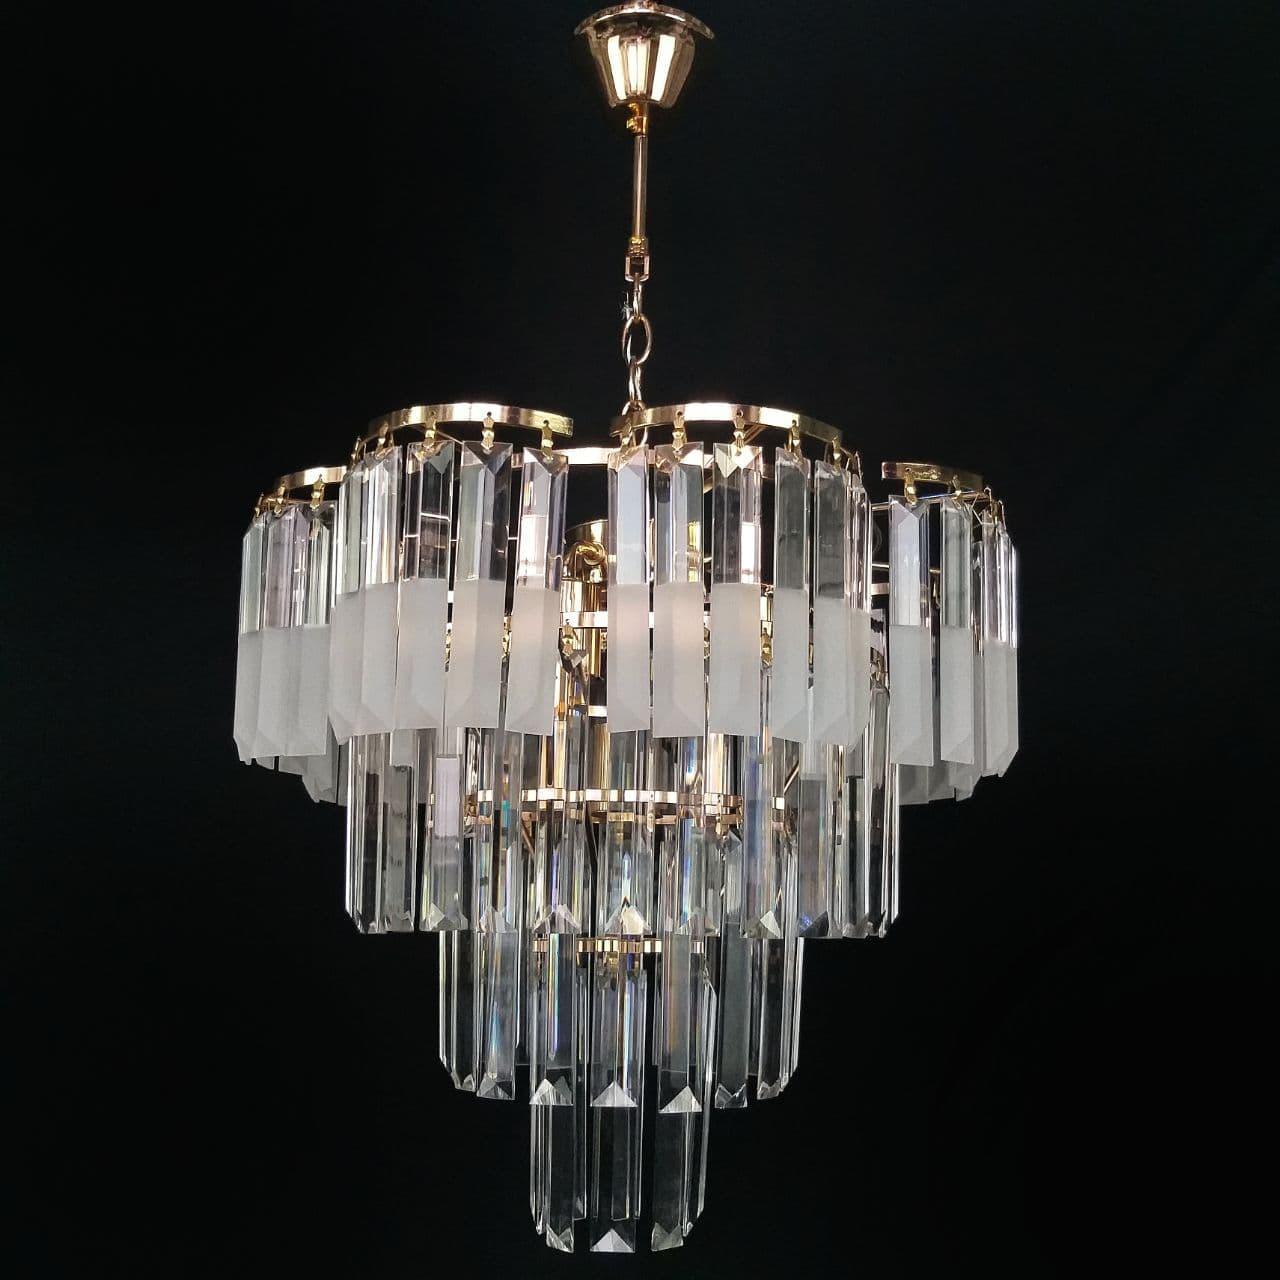 Люстра хрустальная в золоте на 8 лампочек 3-E1841/8